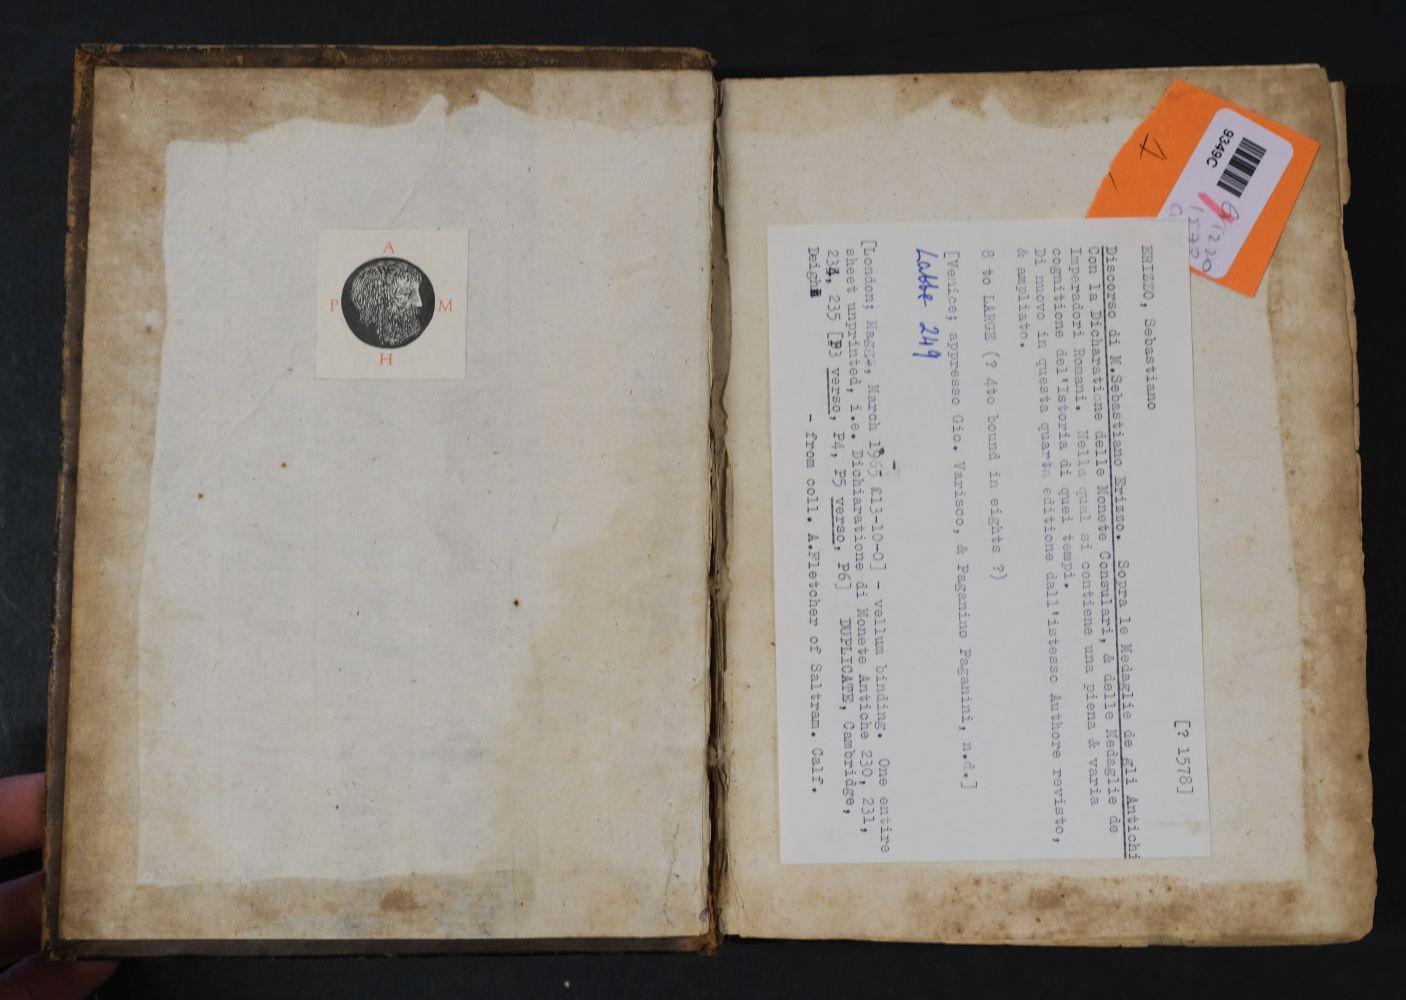 Erizzo (Sebastiano). Discorso sopra le medaglie, 4th edition, 1584, ex libris Fletcher of Saltoun - Image 5 of 11